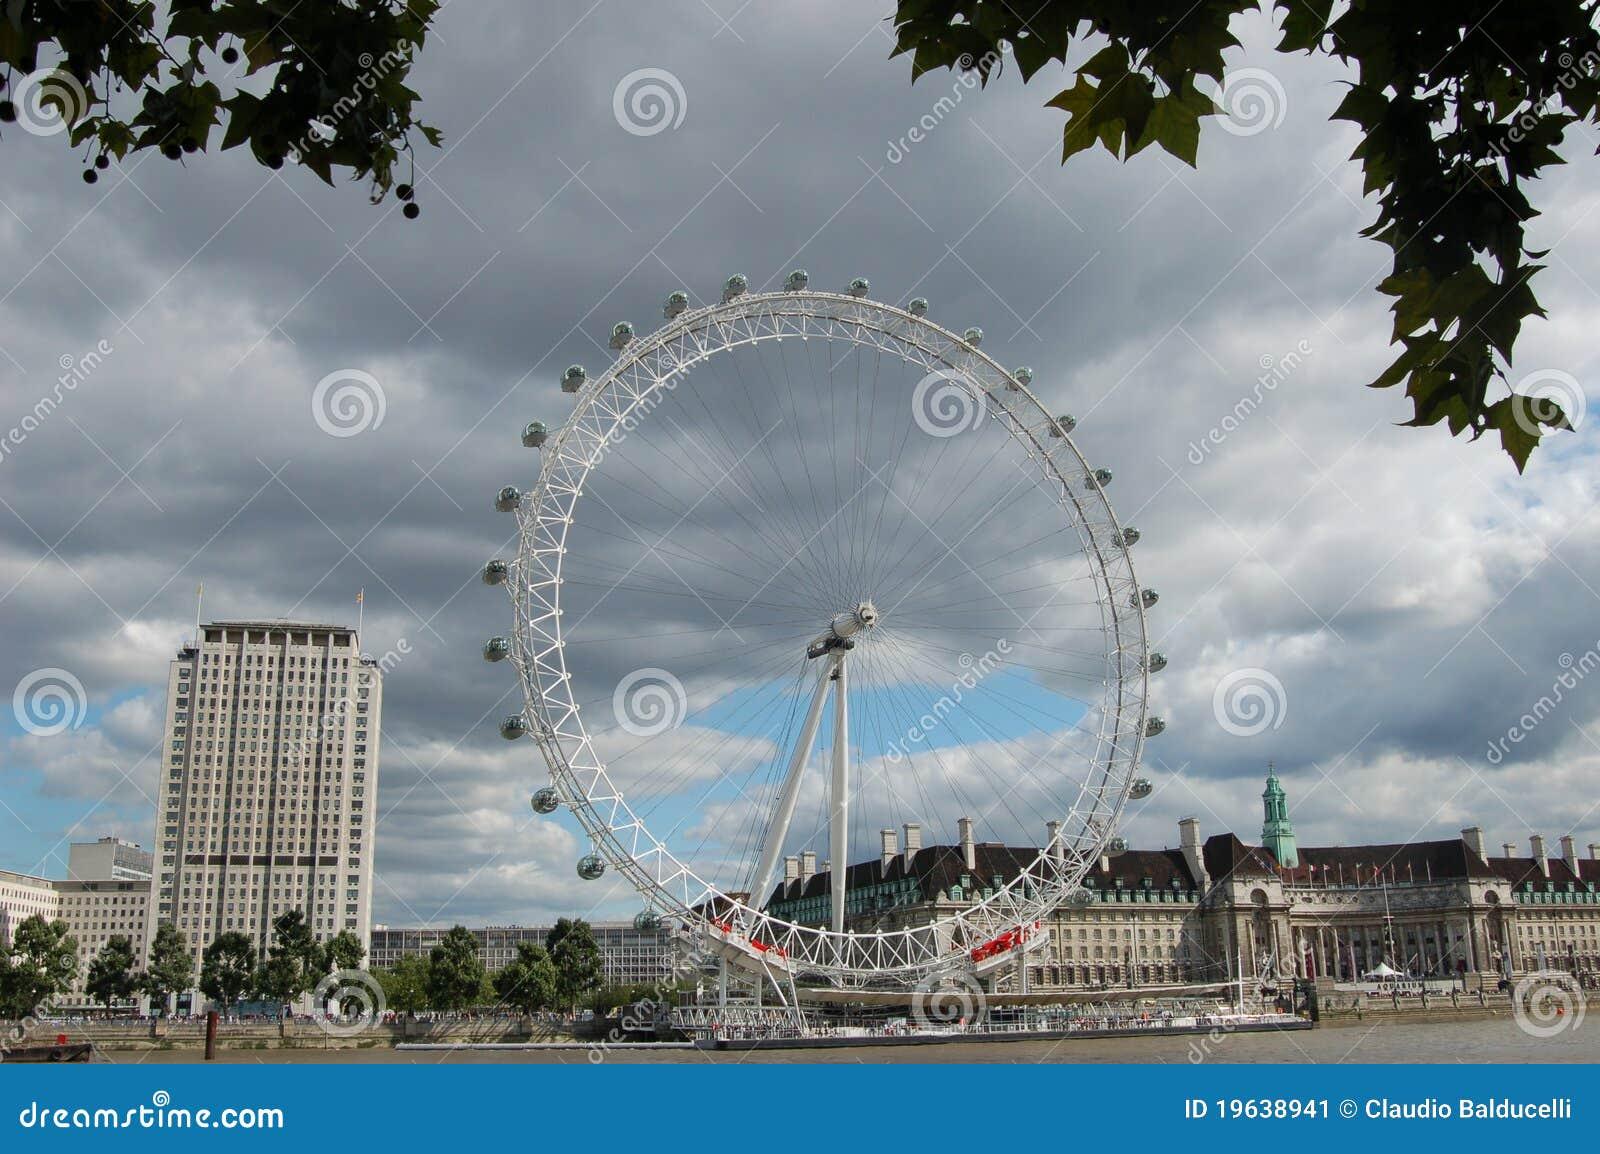 Merlin Entertainments London Eye